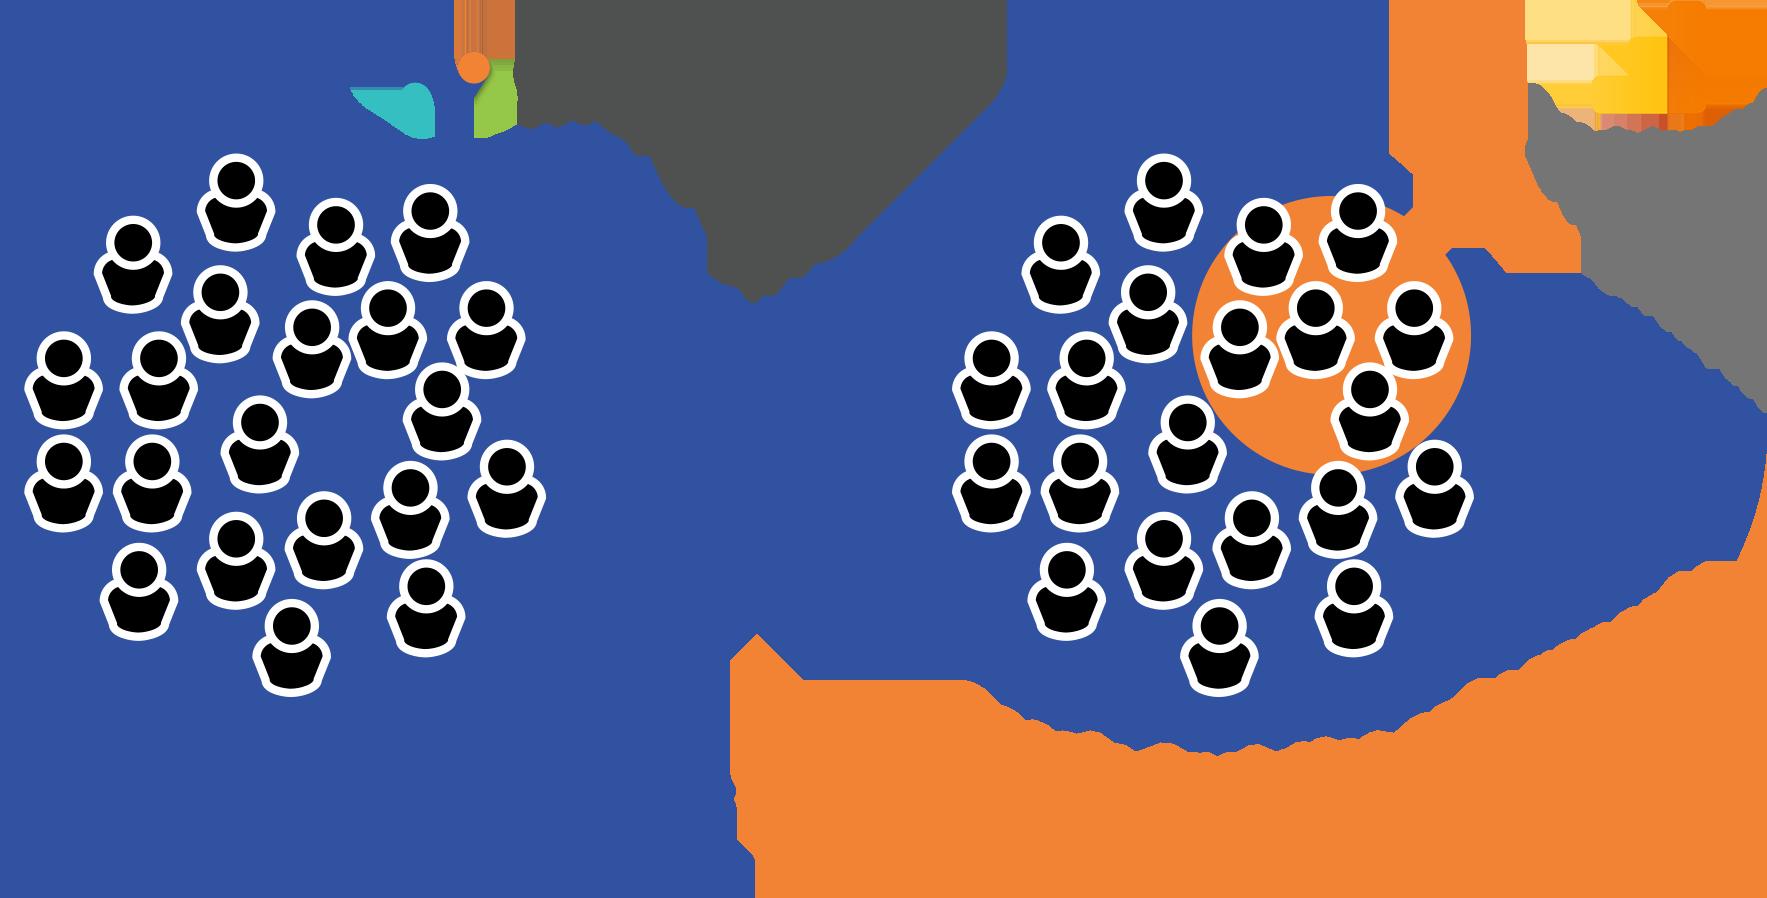 Why Matomo is a serious alternative to Google Analytics 360